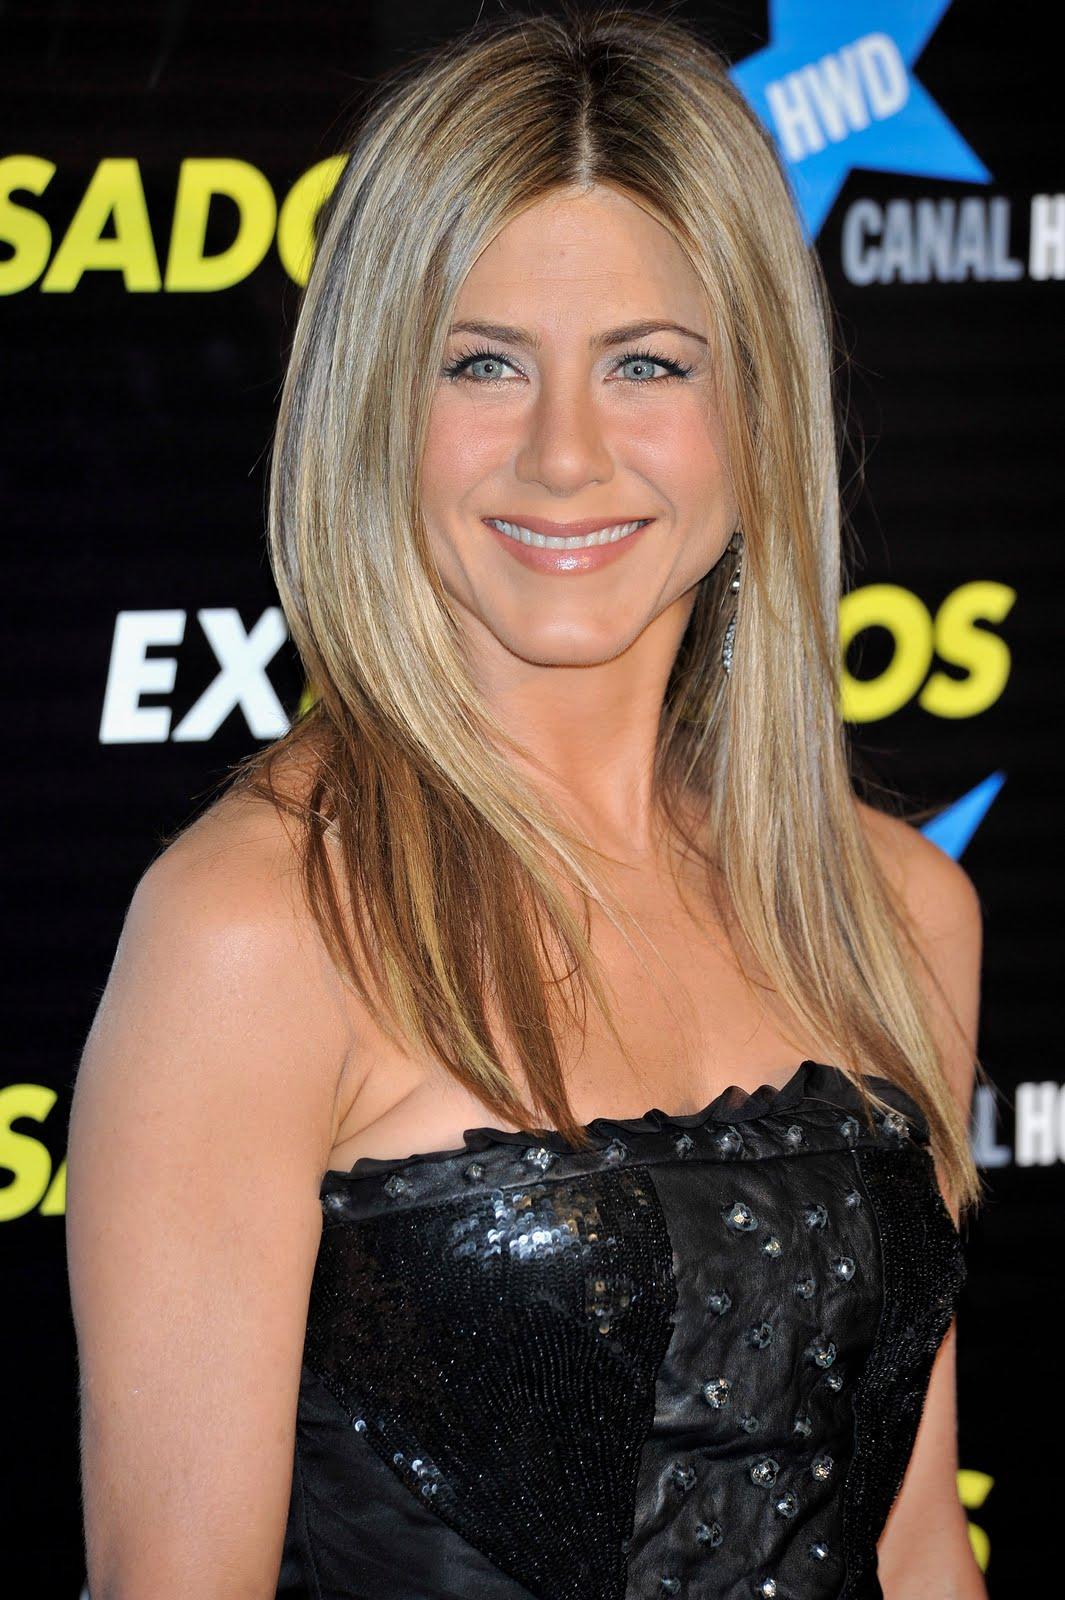 Wallpaper World: Jennifer Aniston HQ Wallpapers